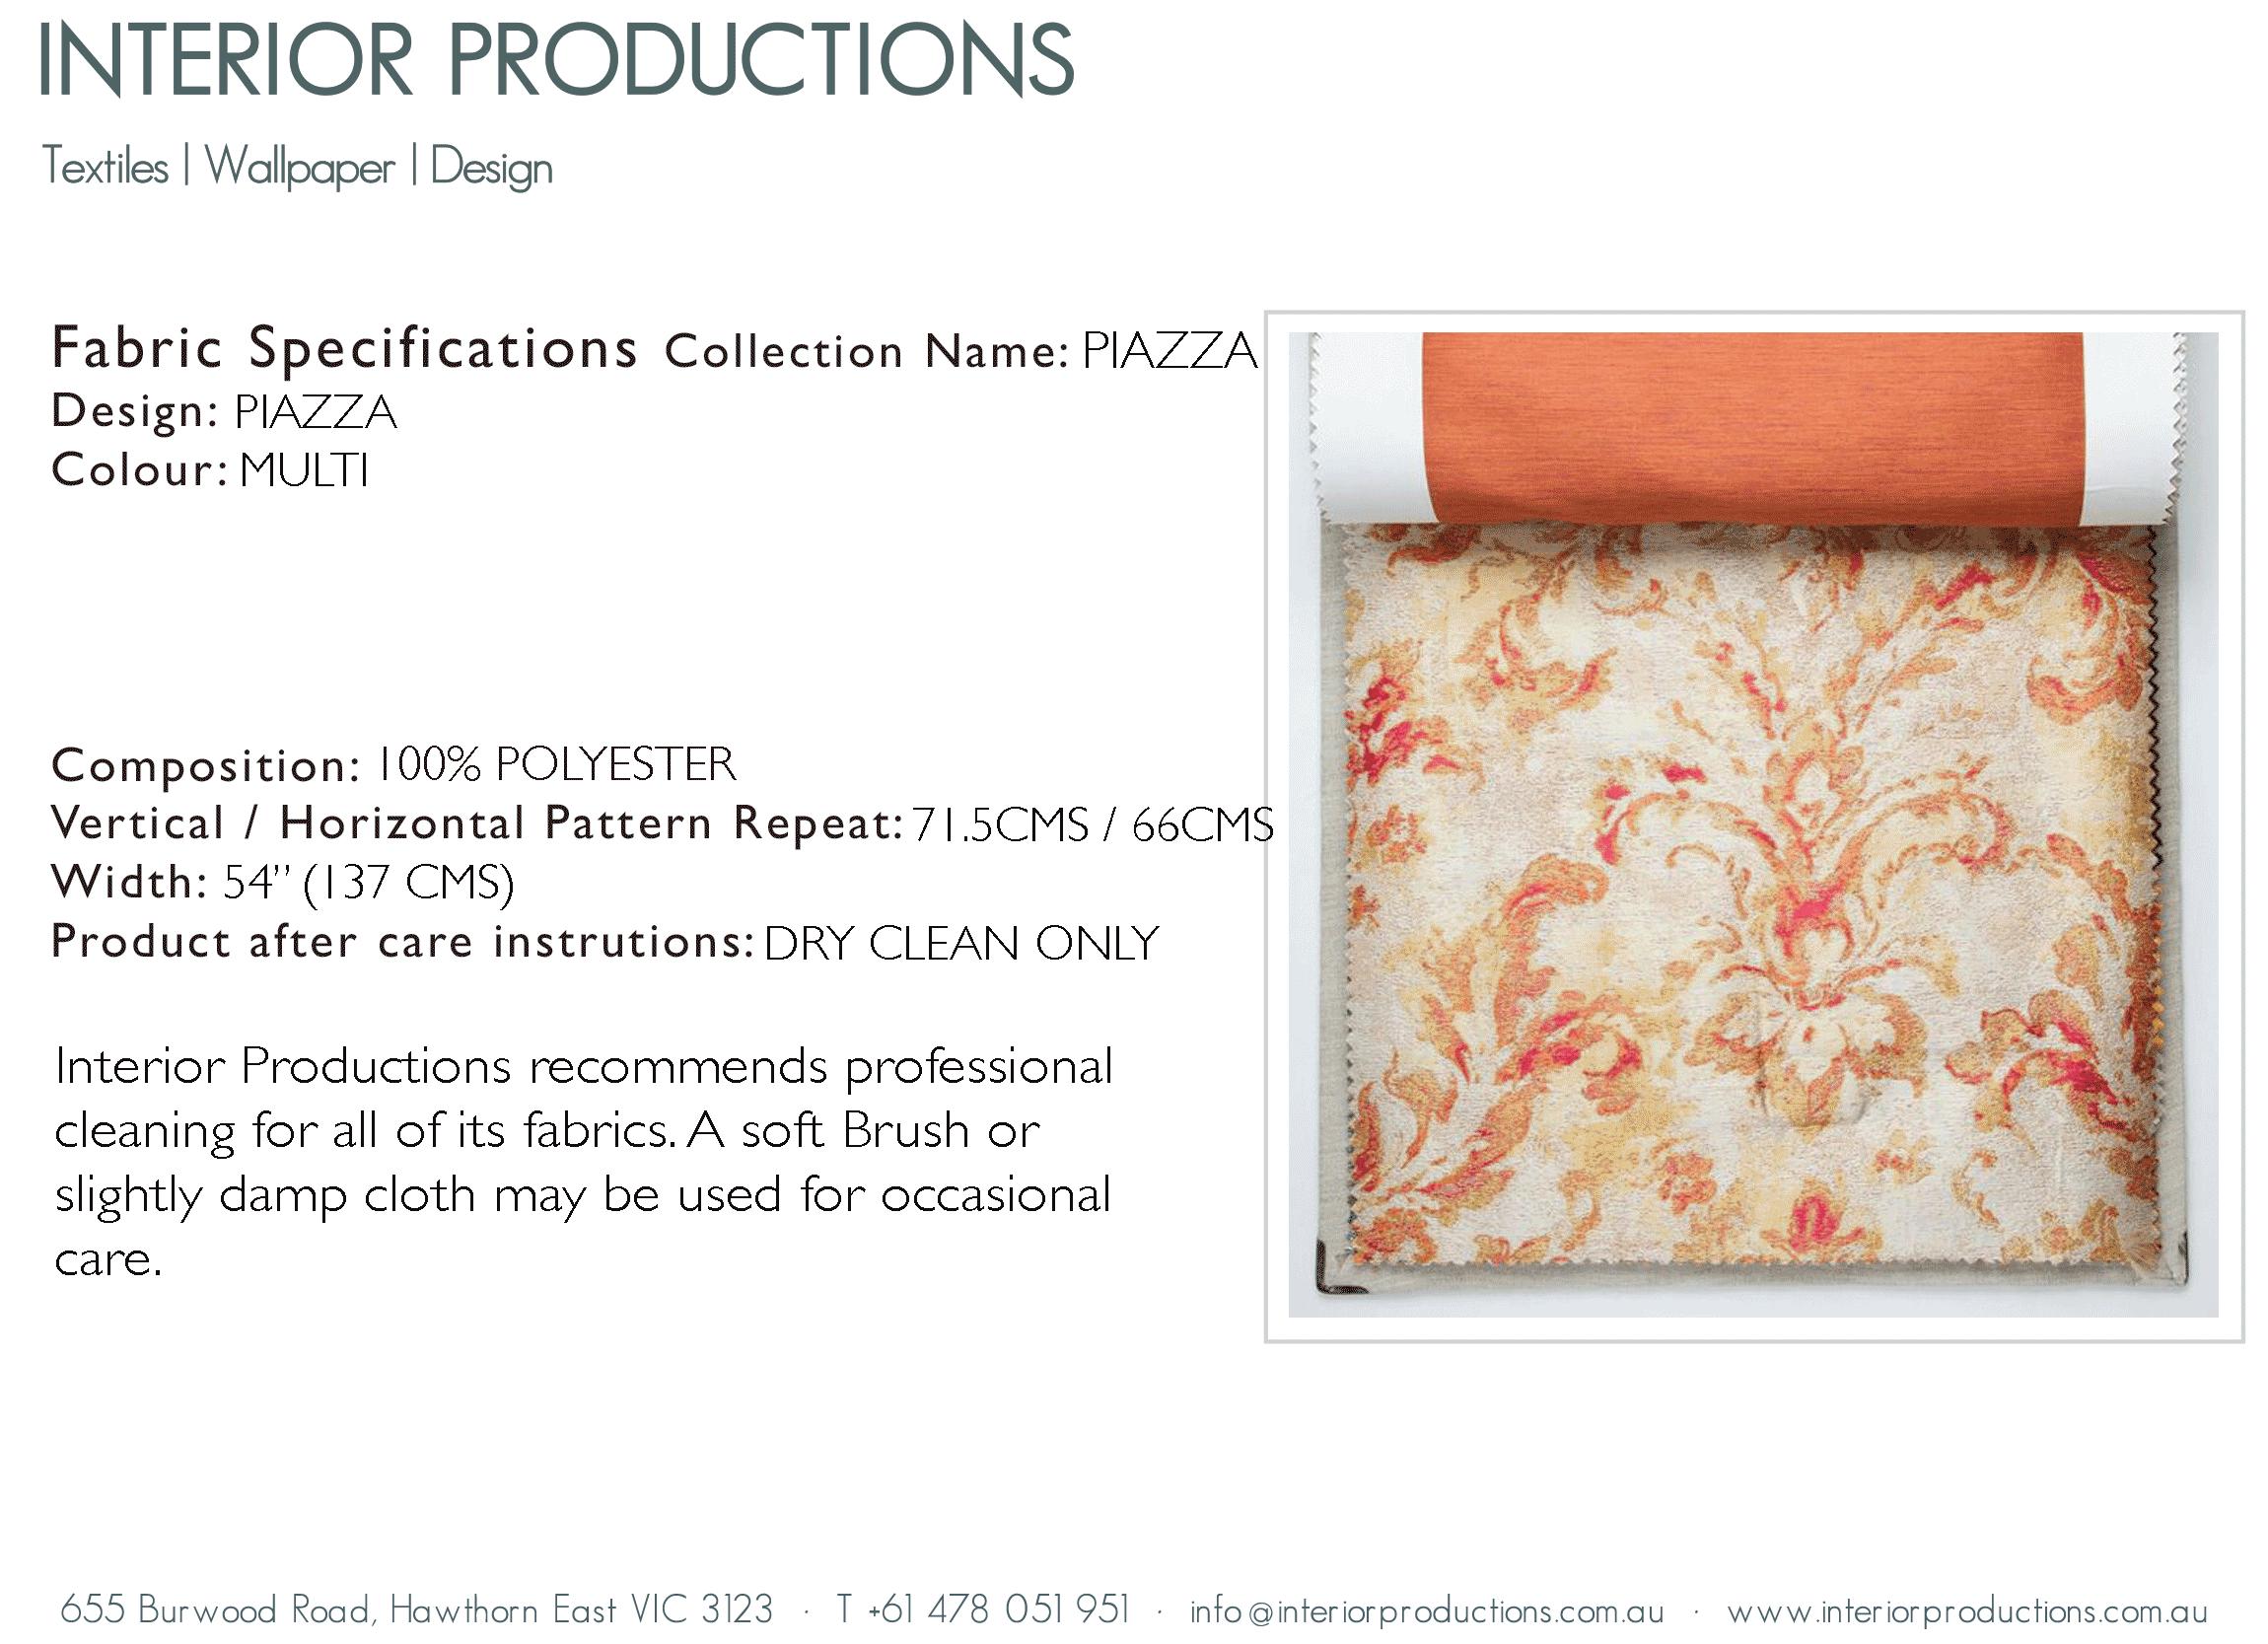 interior_productions_PIAZZA---MULTI